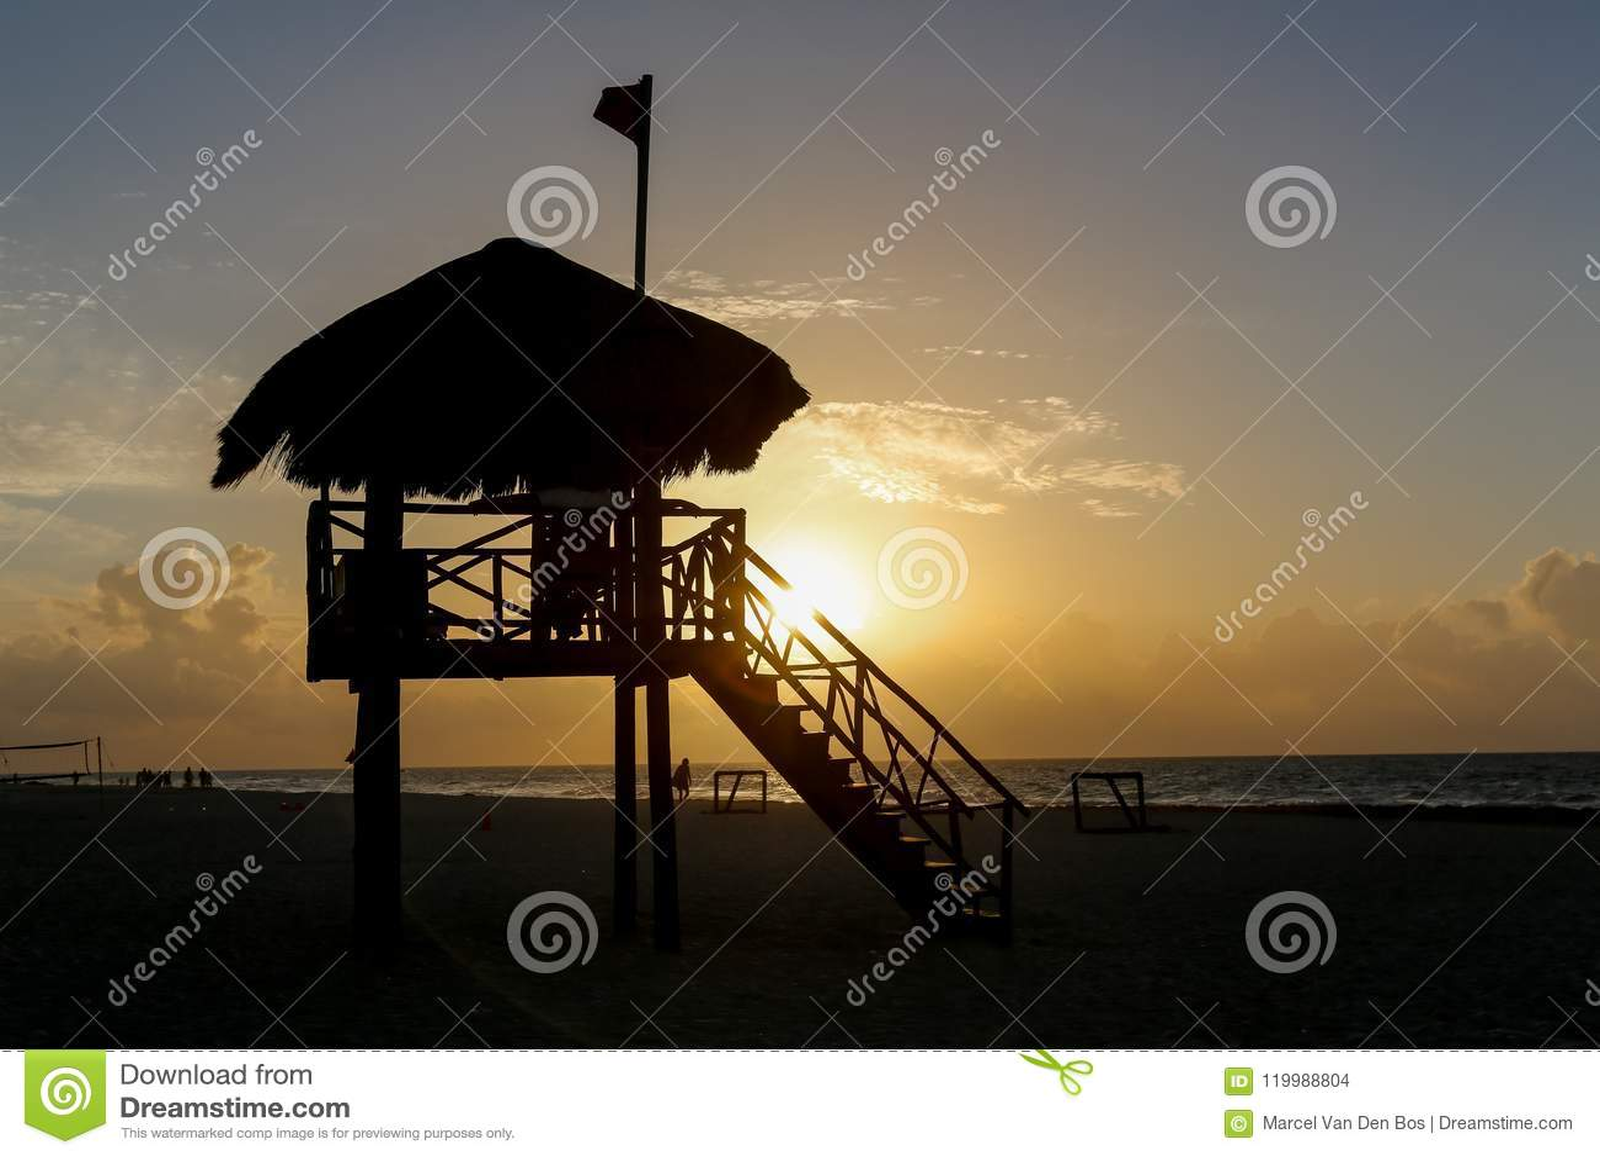 Leibwächterturm am Strand während des runrise